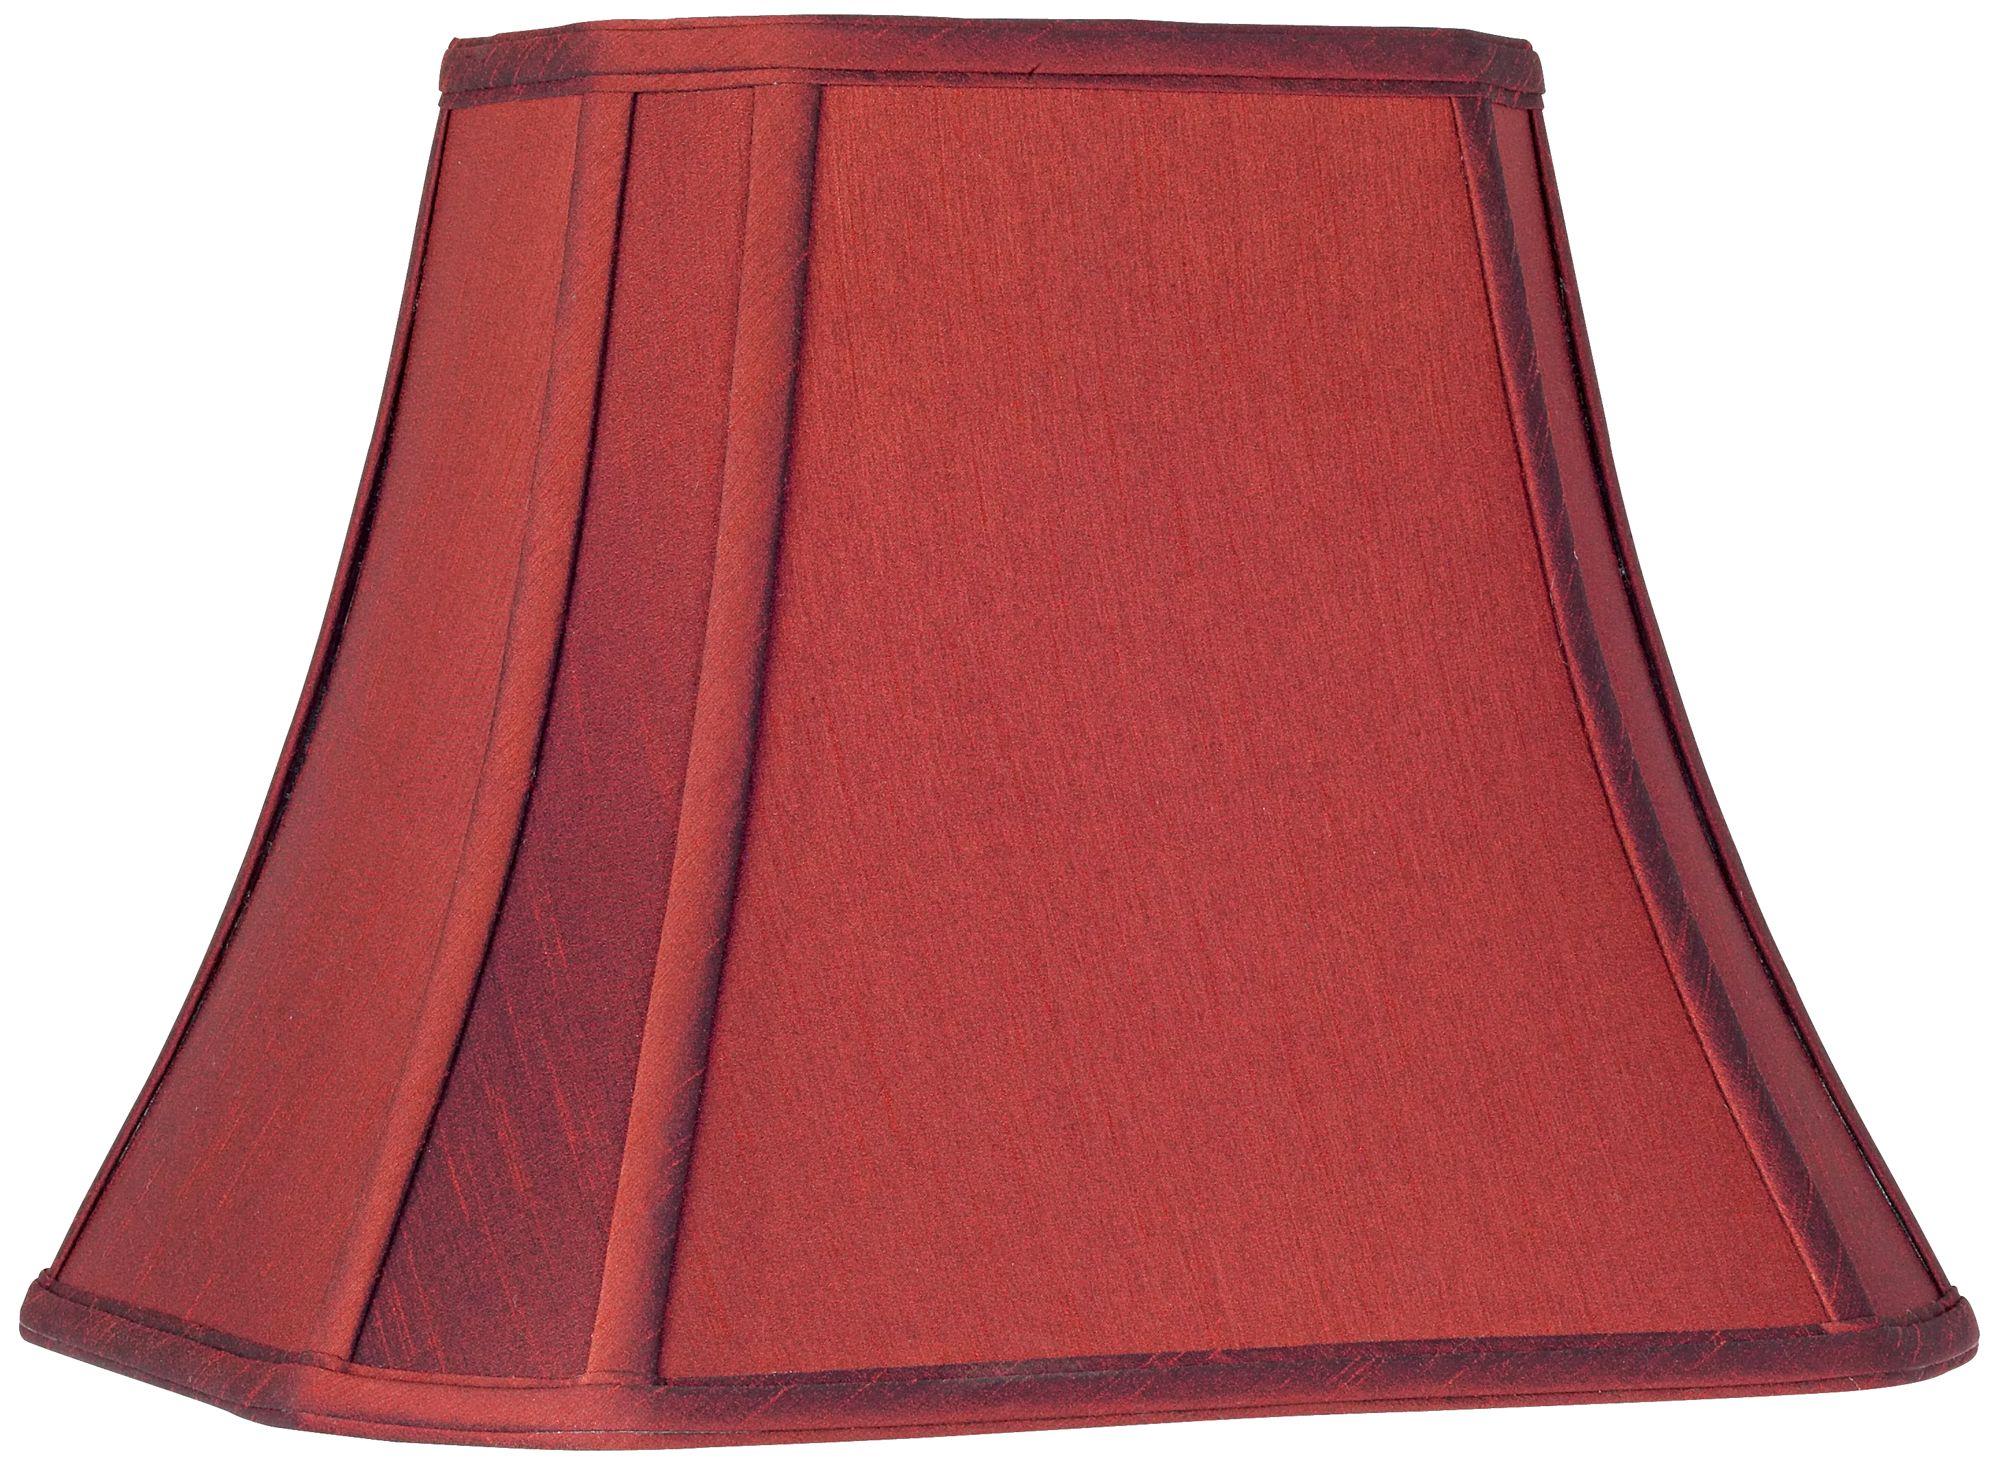 crimson red cutcorner lamp shade 68x1114x11 spider - Red Lamp